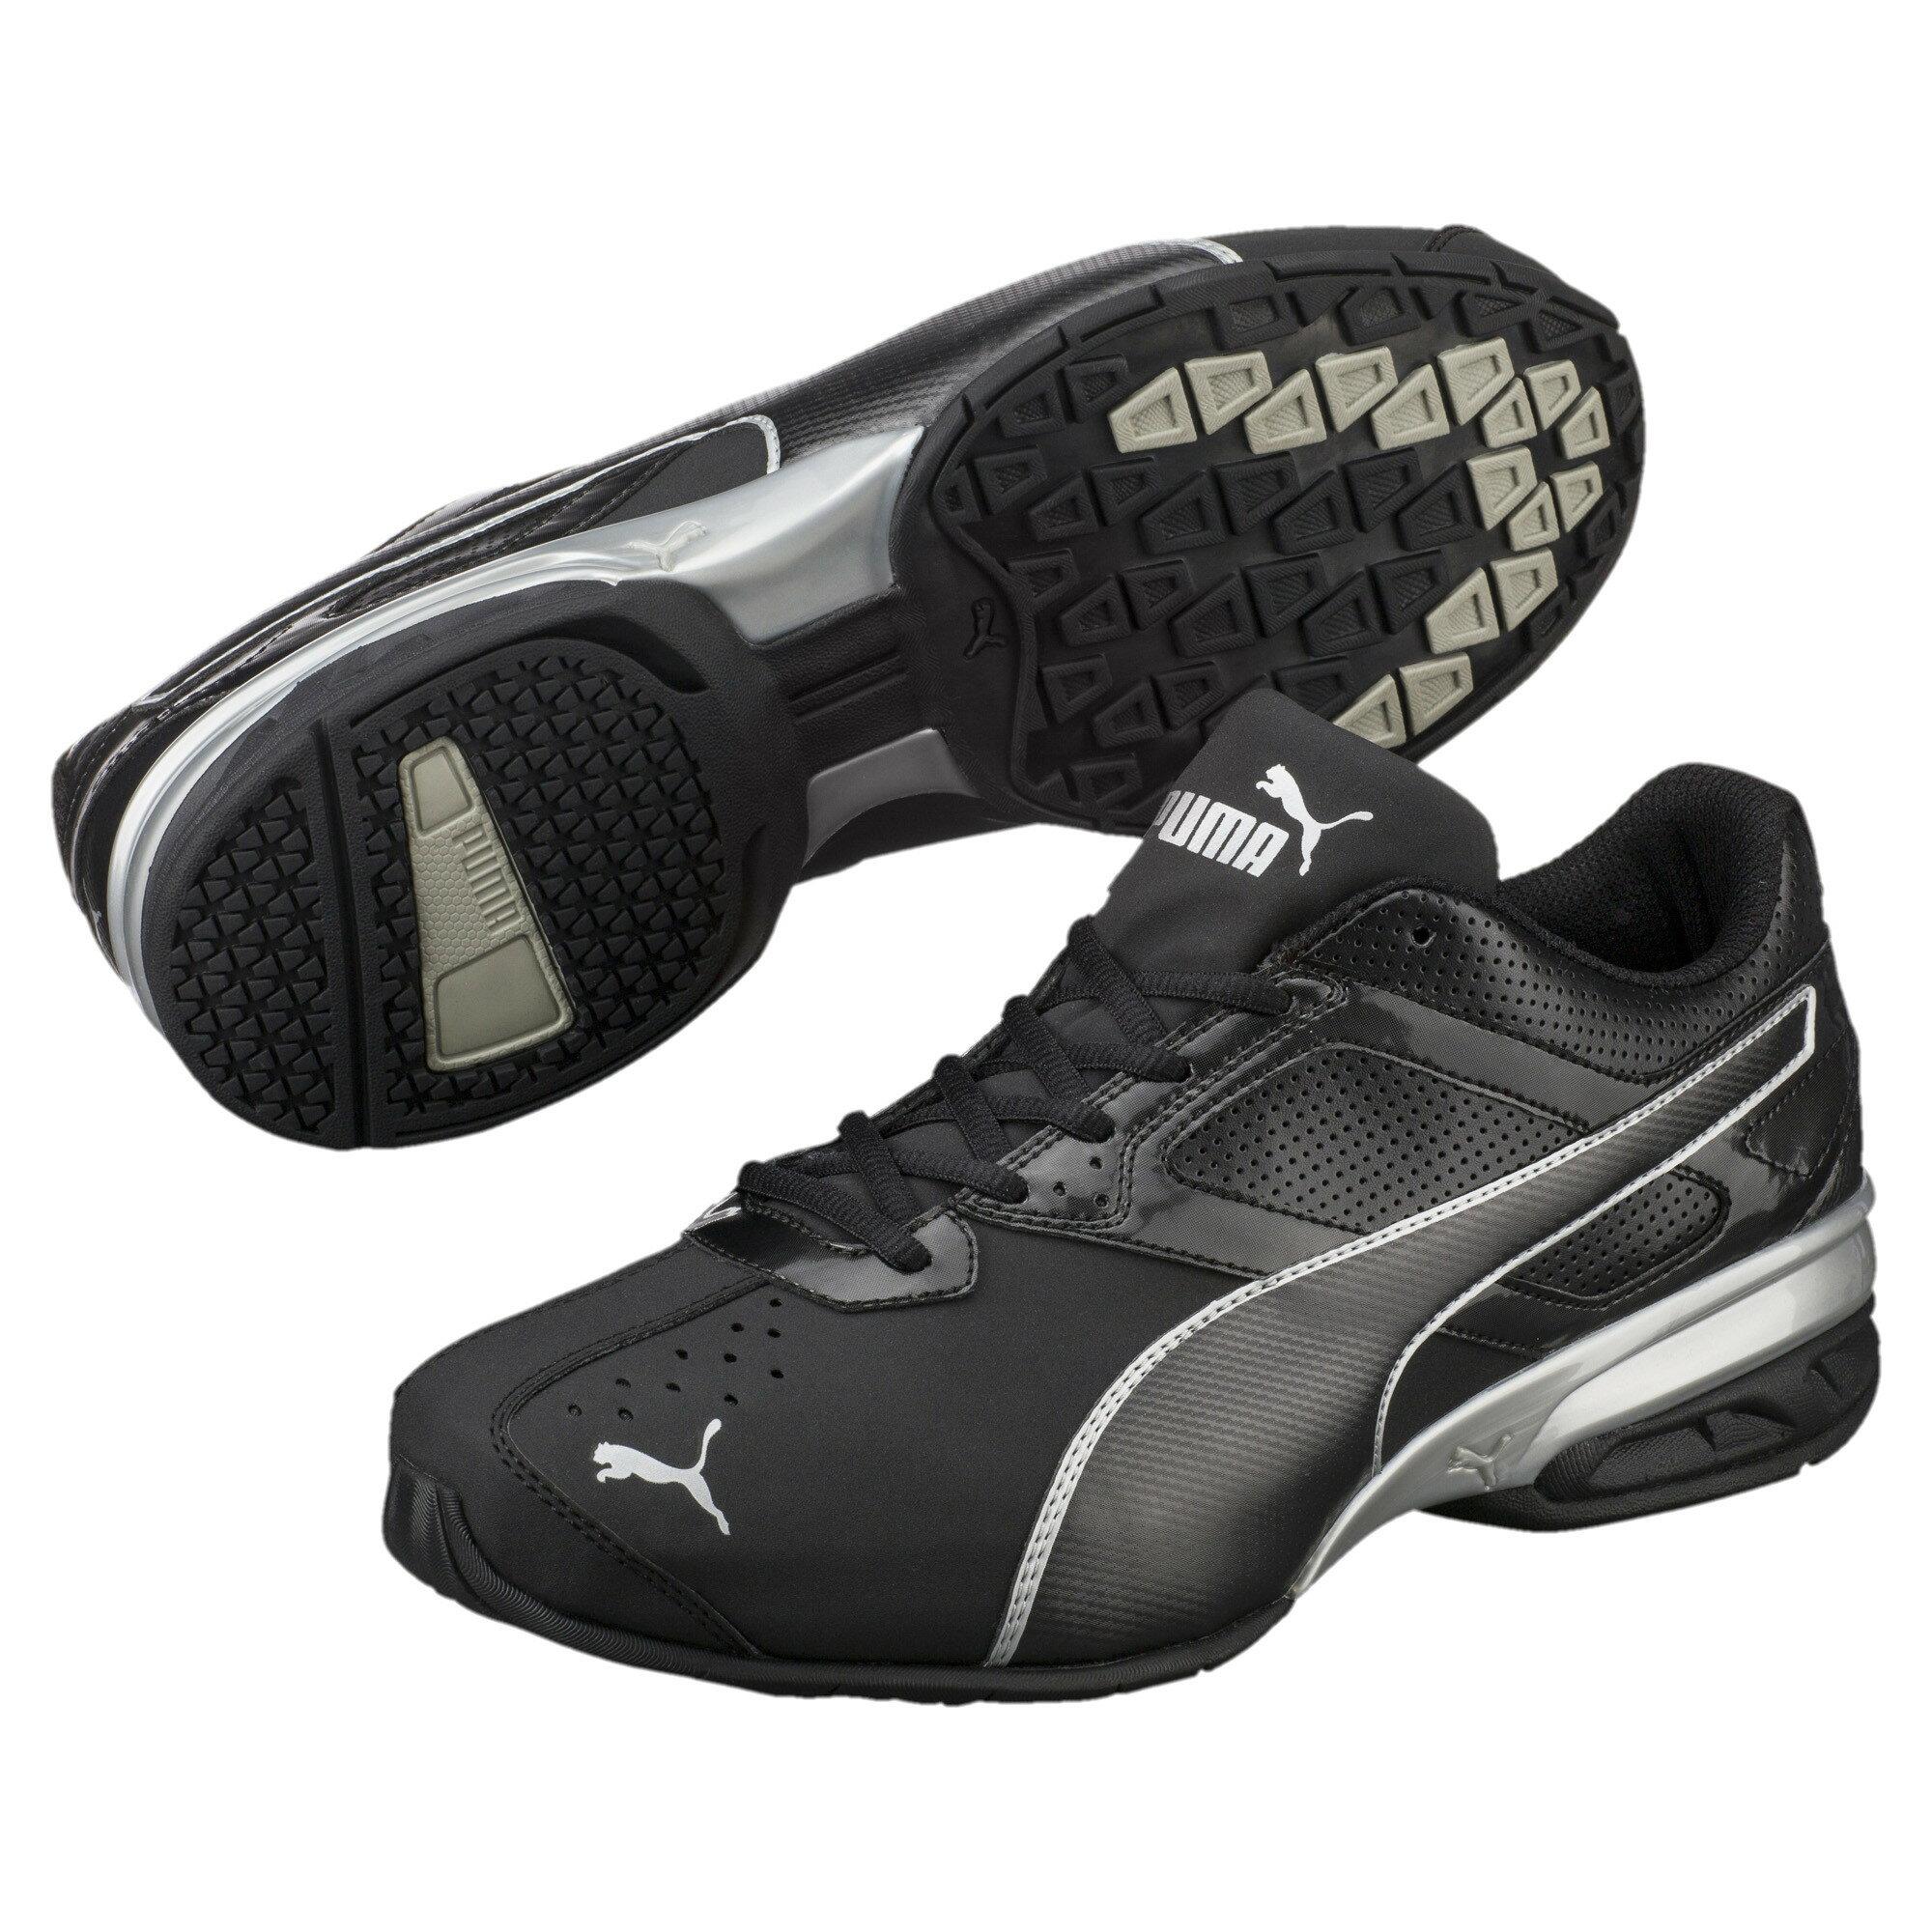 62278dfc3a5 Official Puma Store  PUMA Tazon 6 FM Wide Men s Sneakers